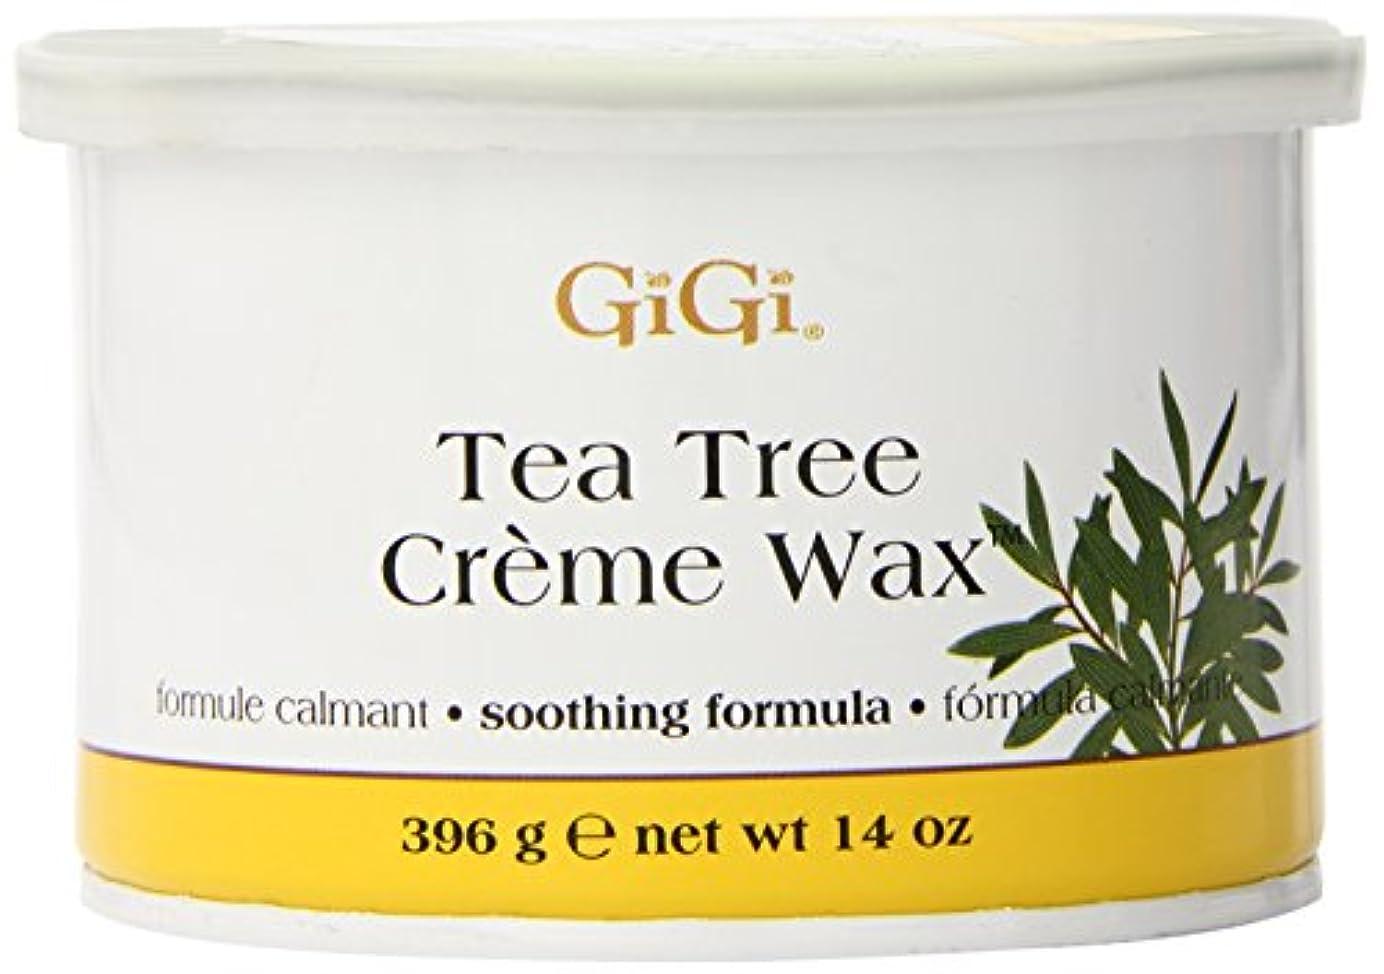 GiGi Tea Tree Cream Wax A Soothing Hair Removal Formula 396g